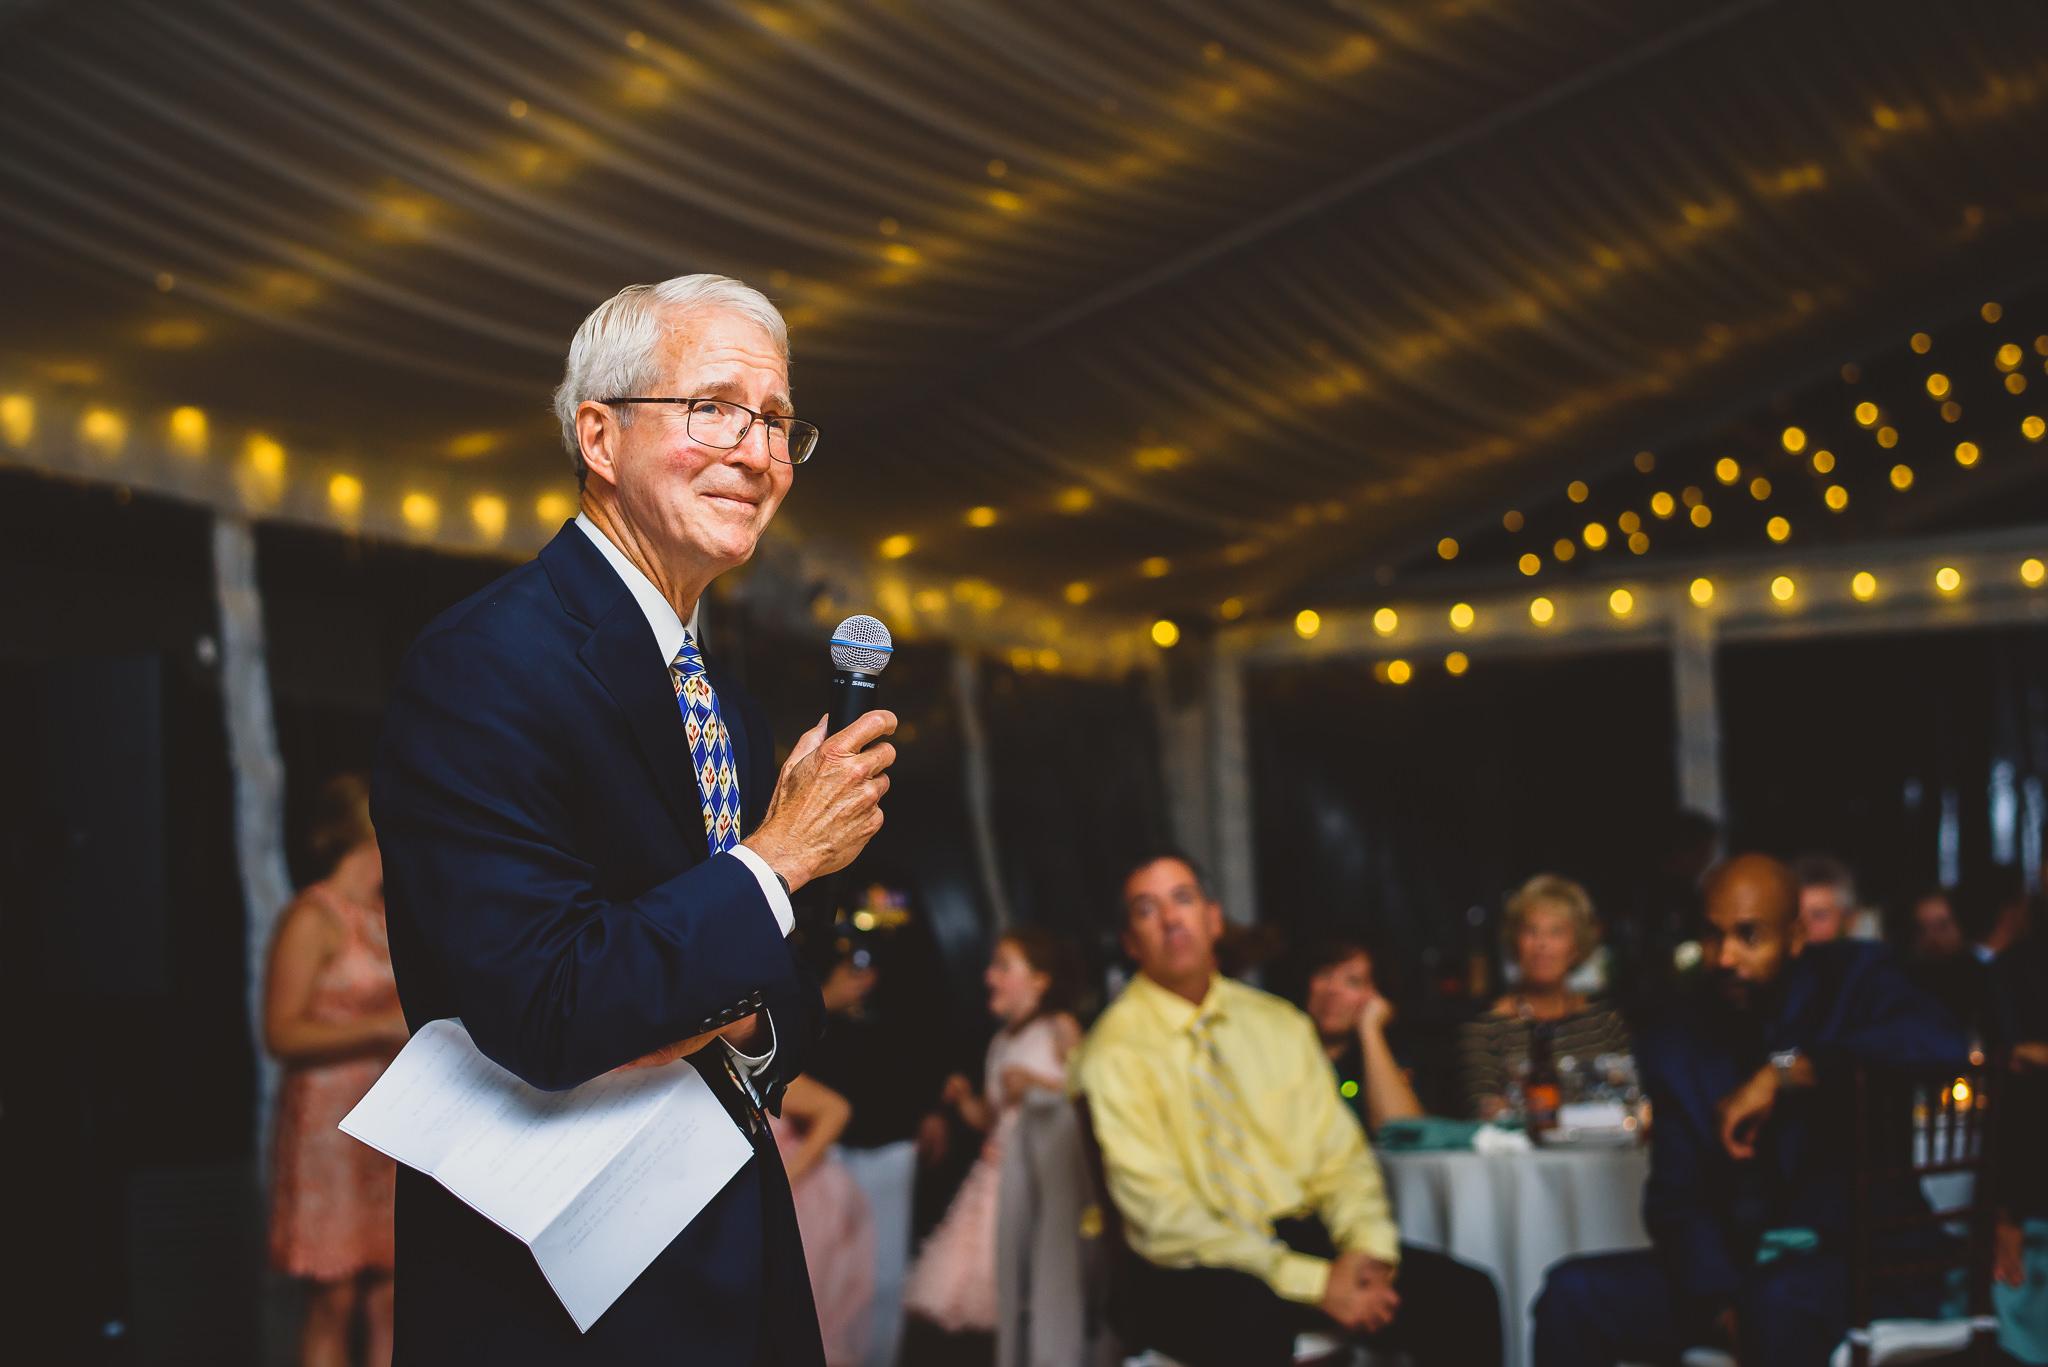 Glen Foerd On the Delaware Wedding